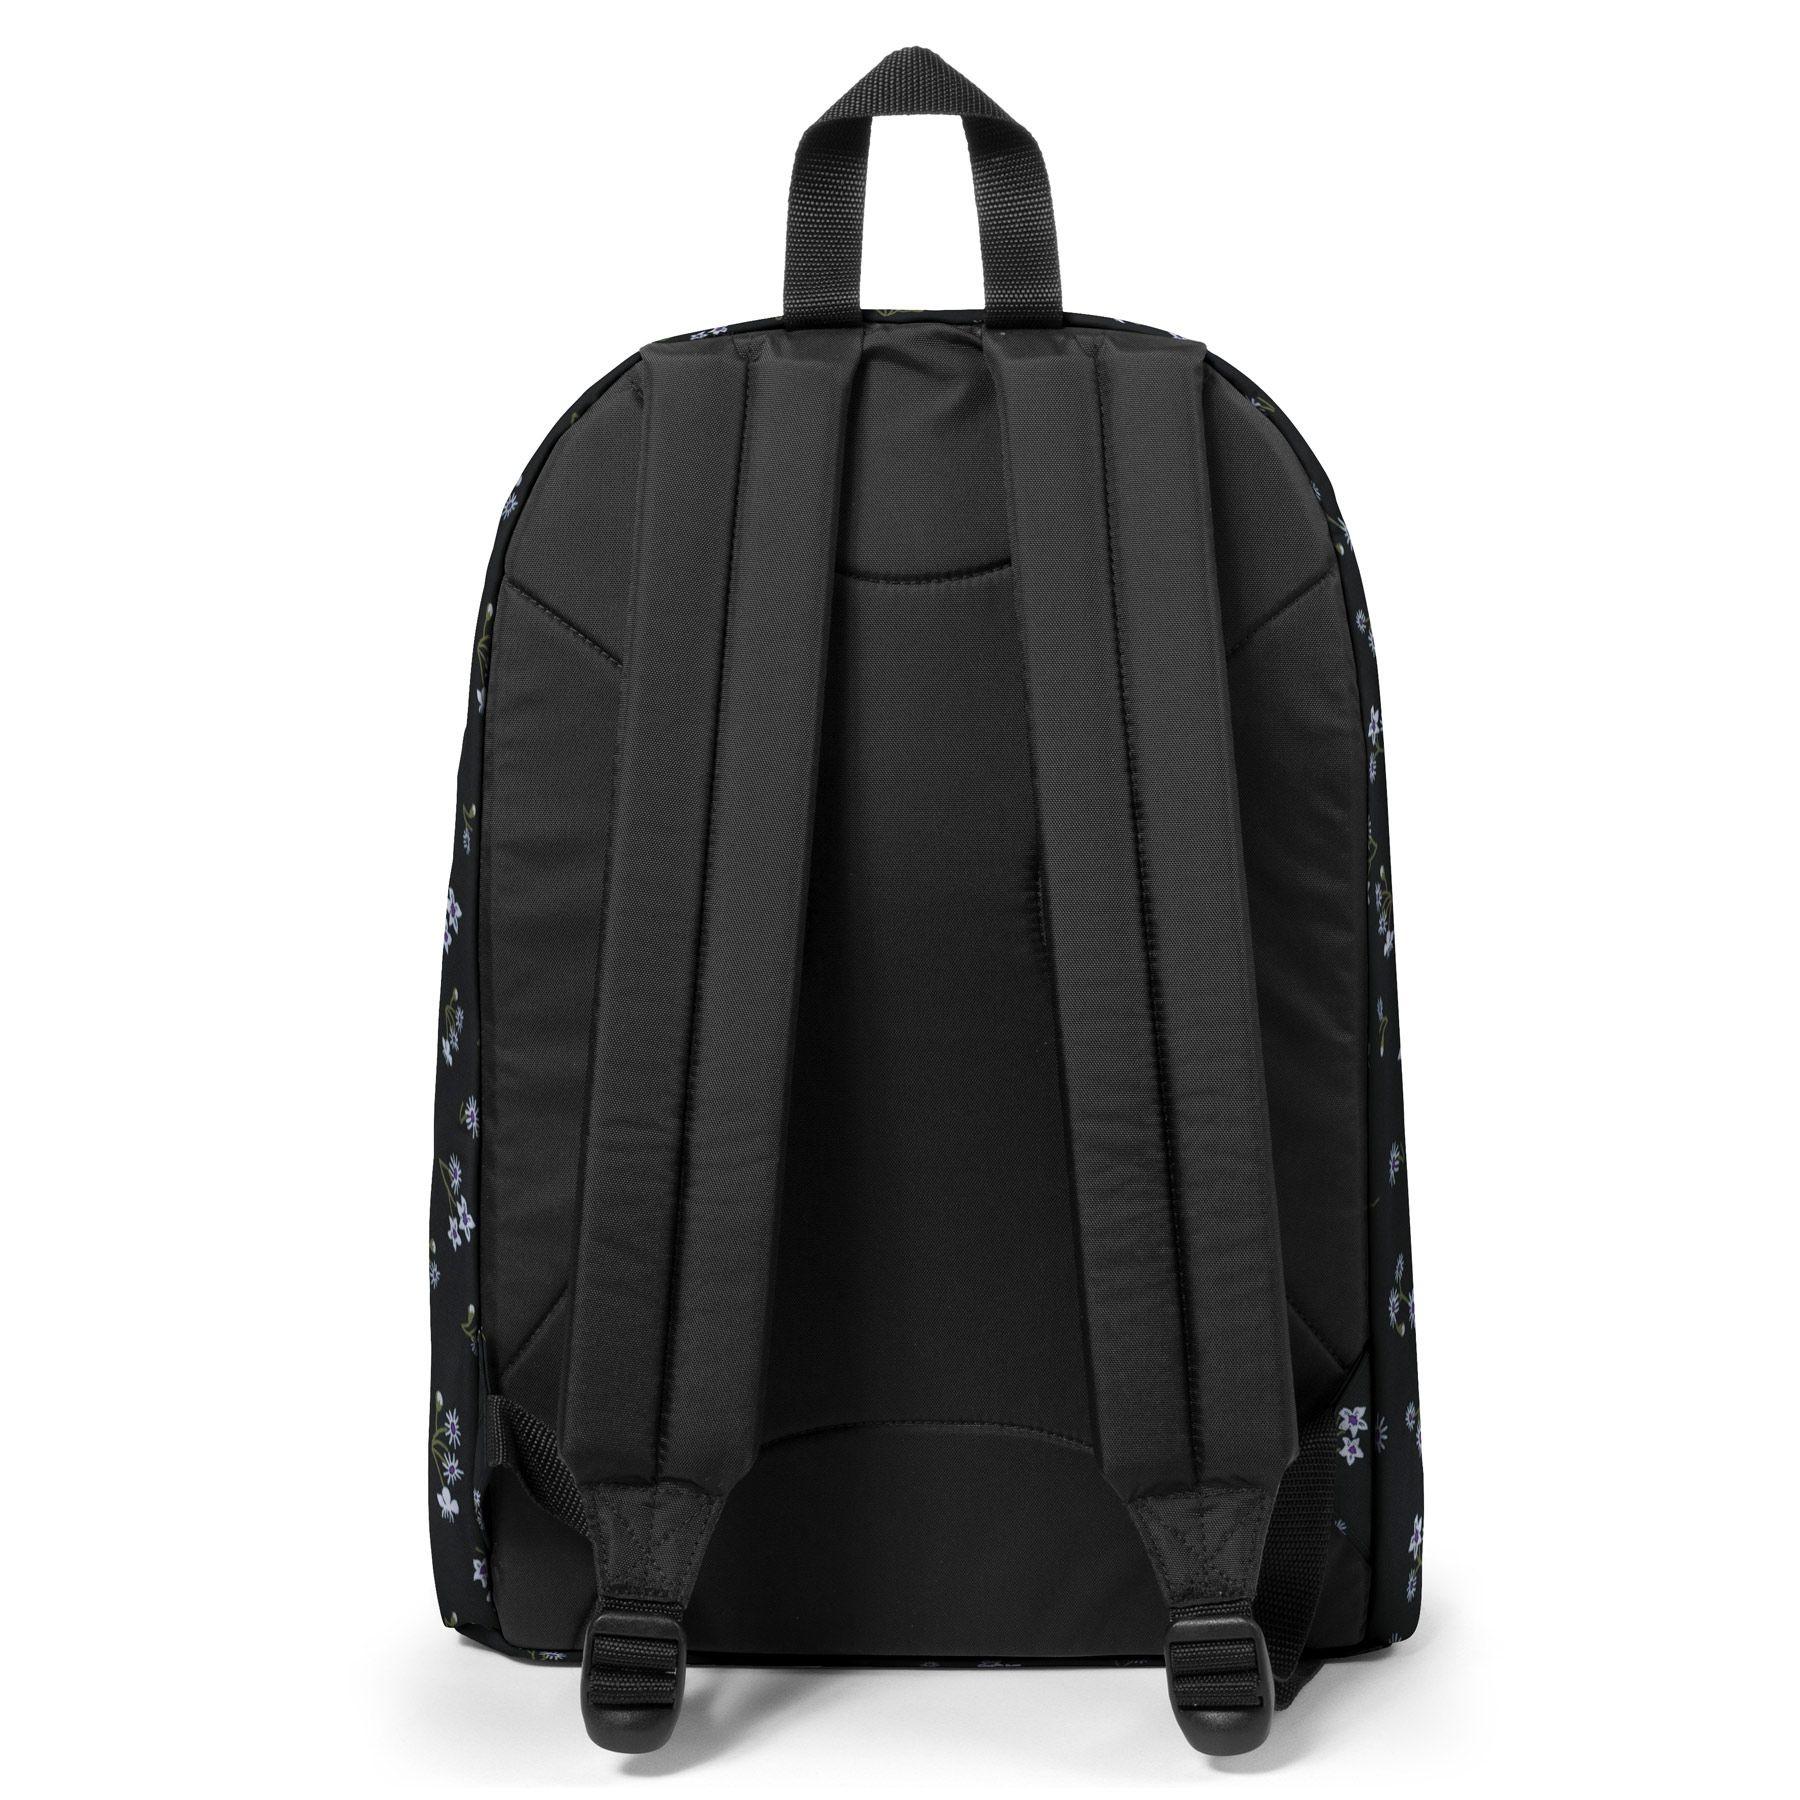 Eastpak Eastpak Out Of Office Bliss Dark 15 inch laptop rugtas